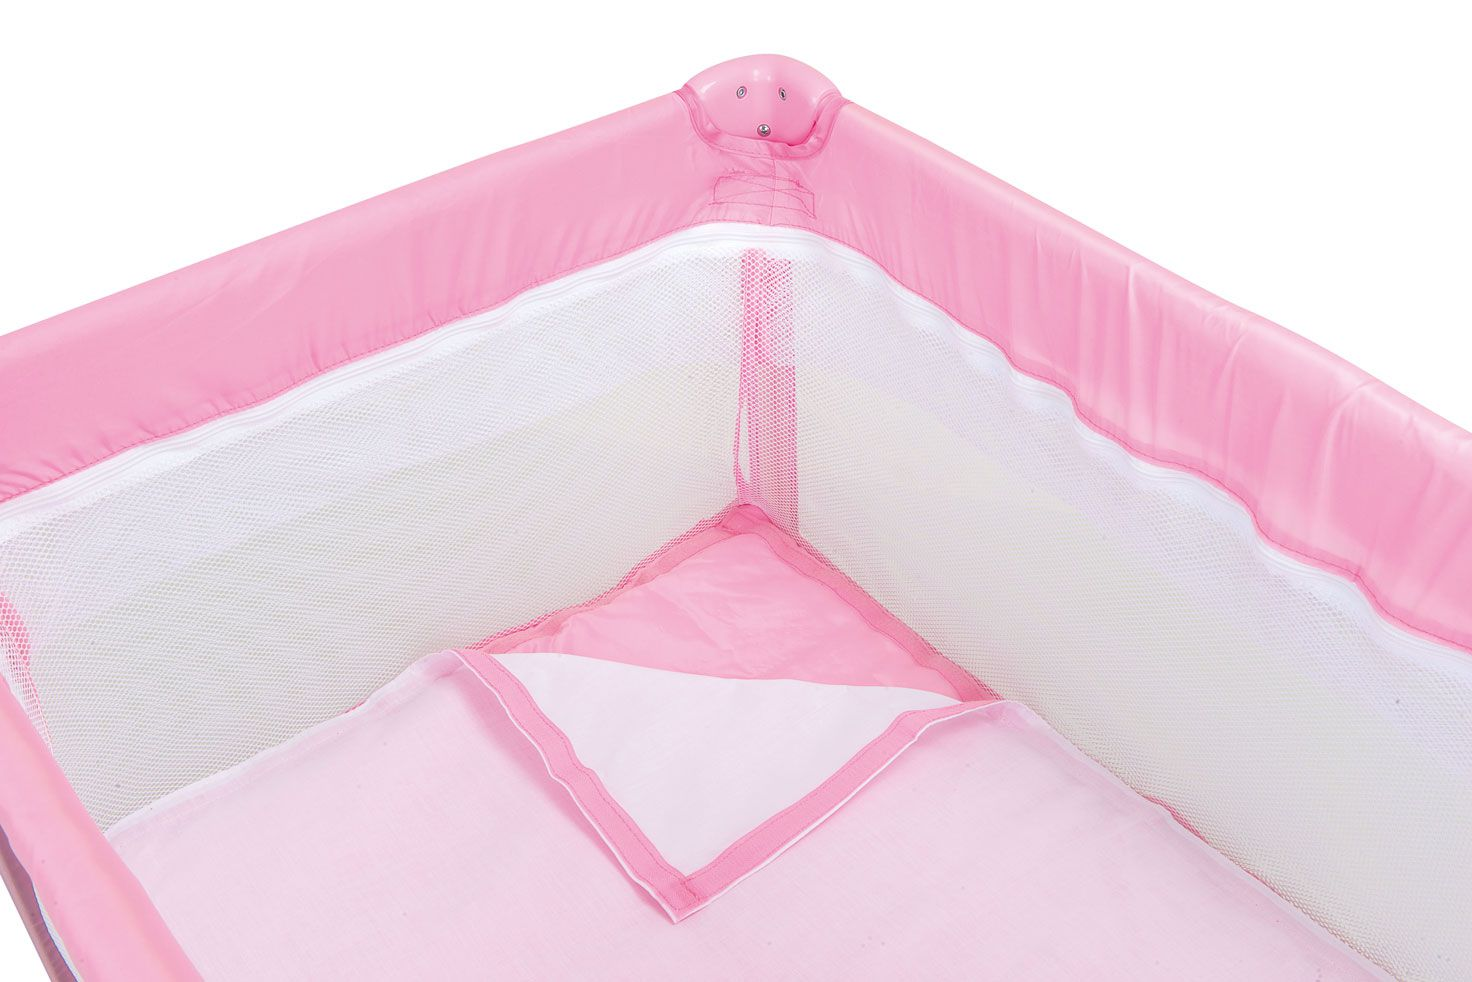 Berço New Cuore Pink  Burigotto